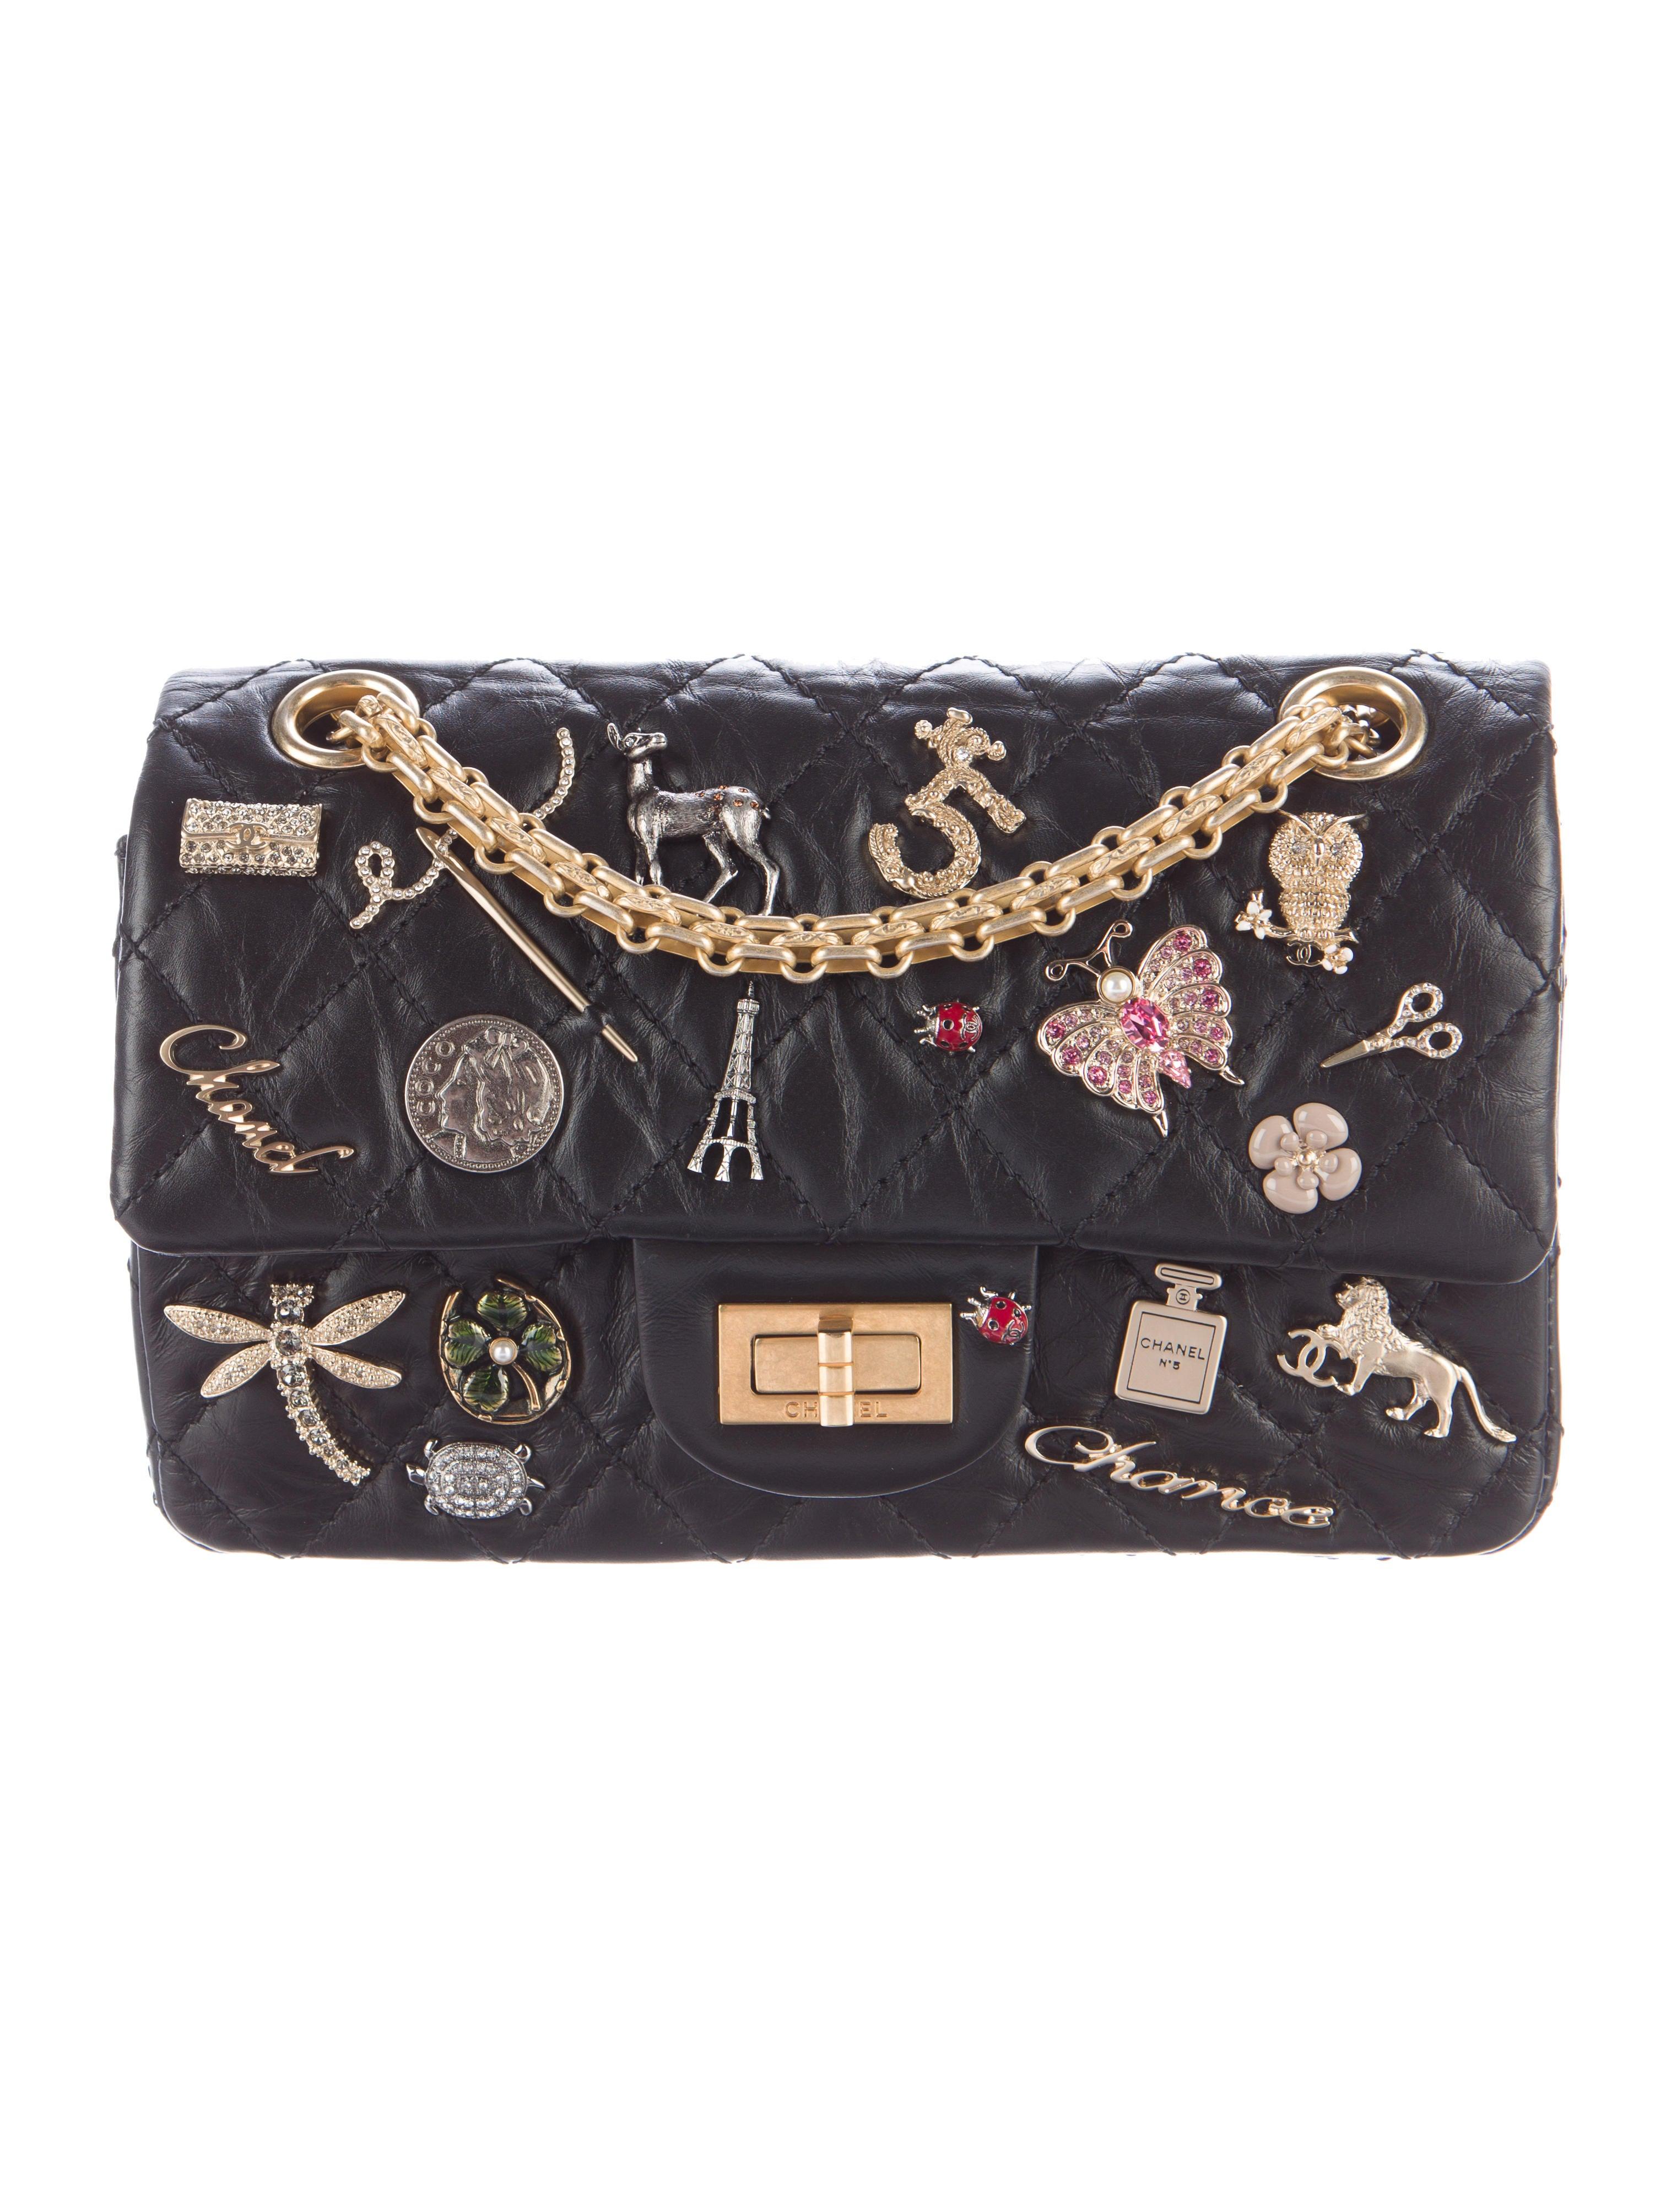 chanel 2017 handbags. 2017 lucky charms 2.55 reissue double flap bag chanel handbags